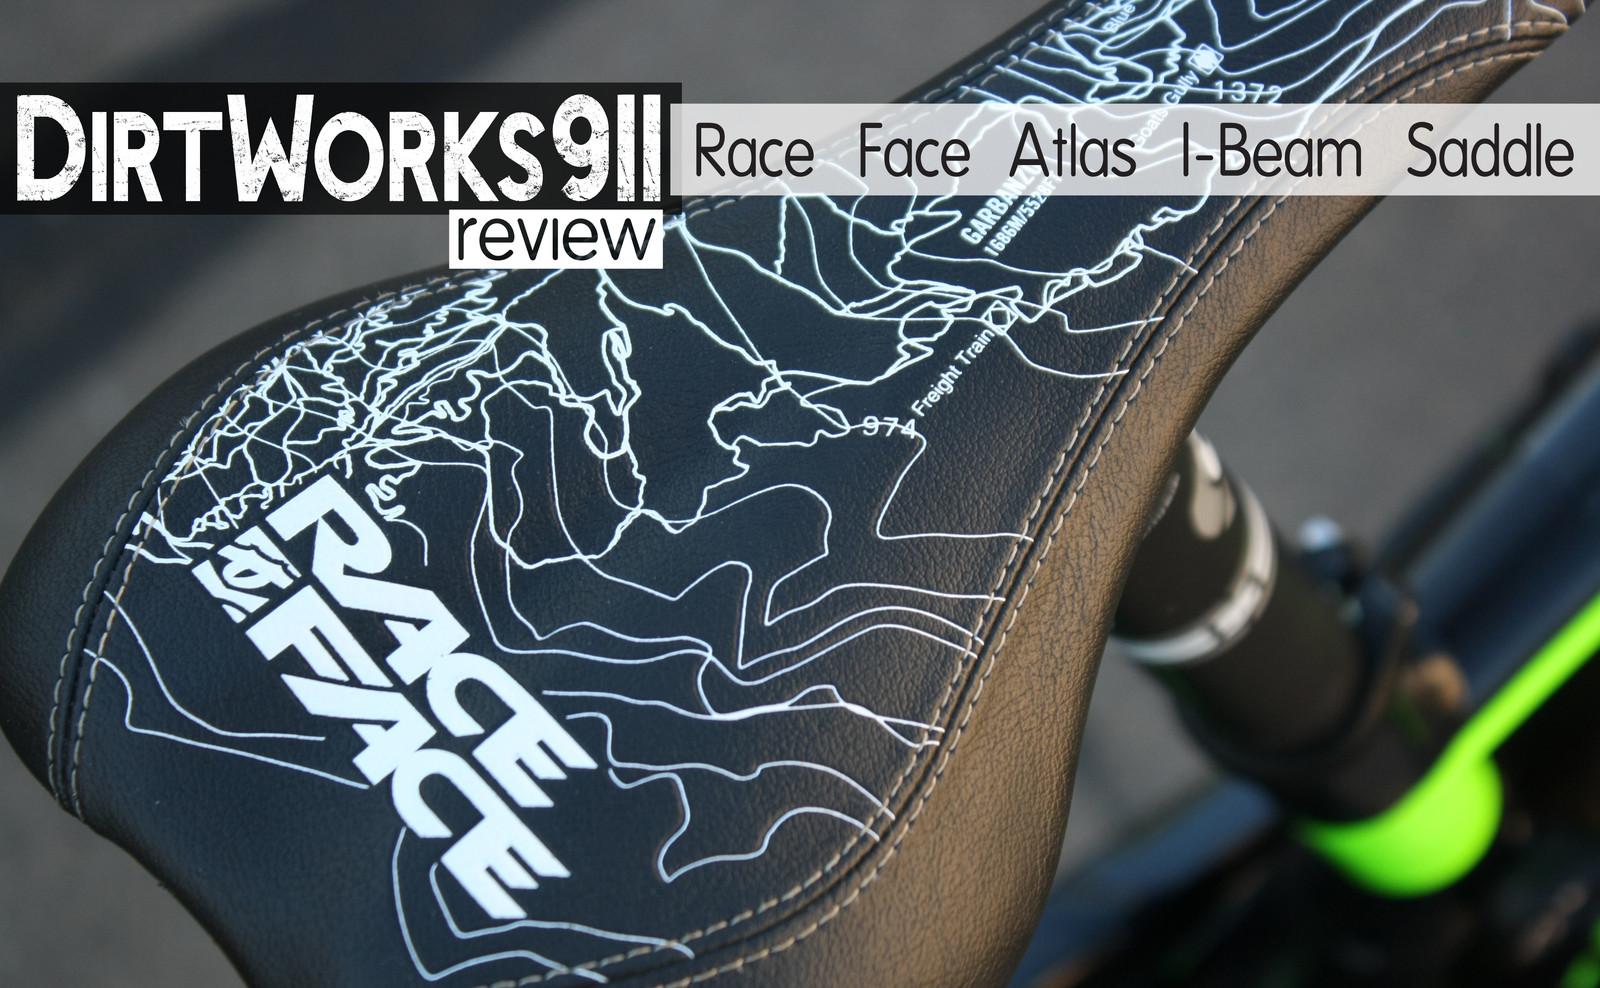 Race Face Atlas I-Beam Saddle